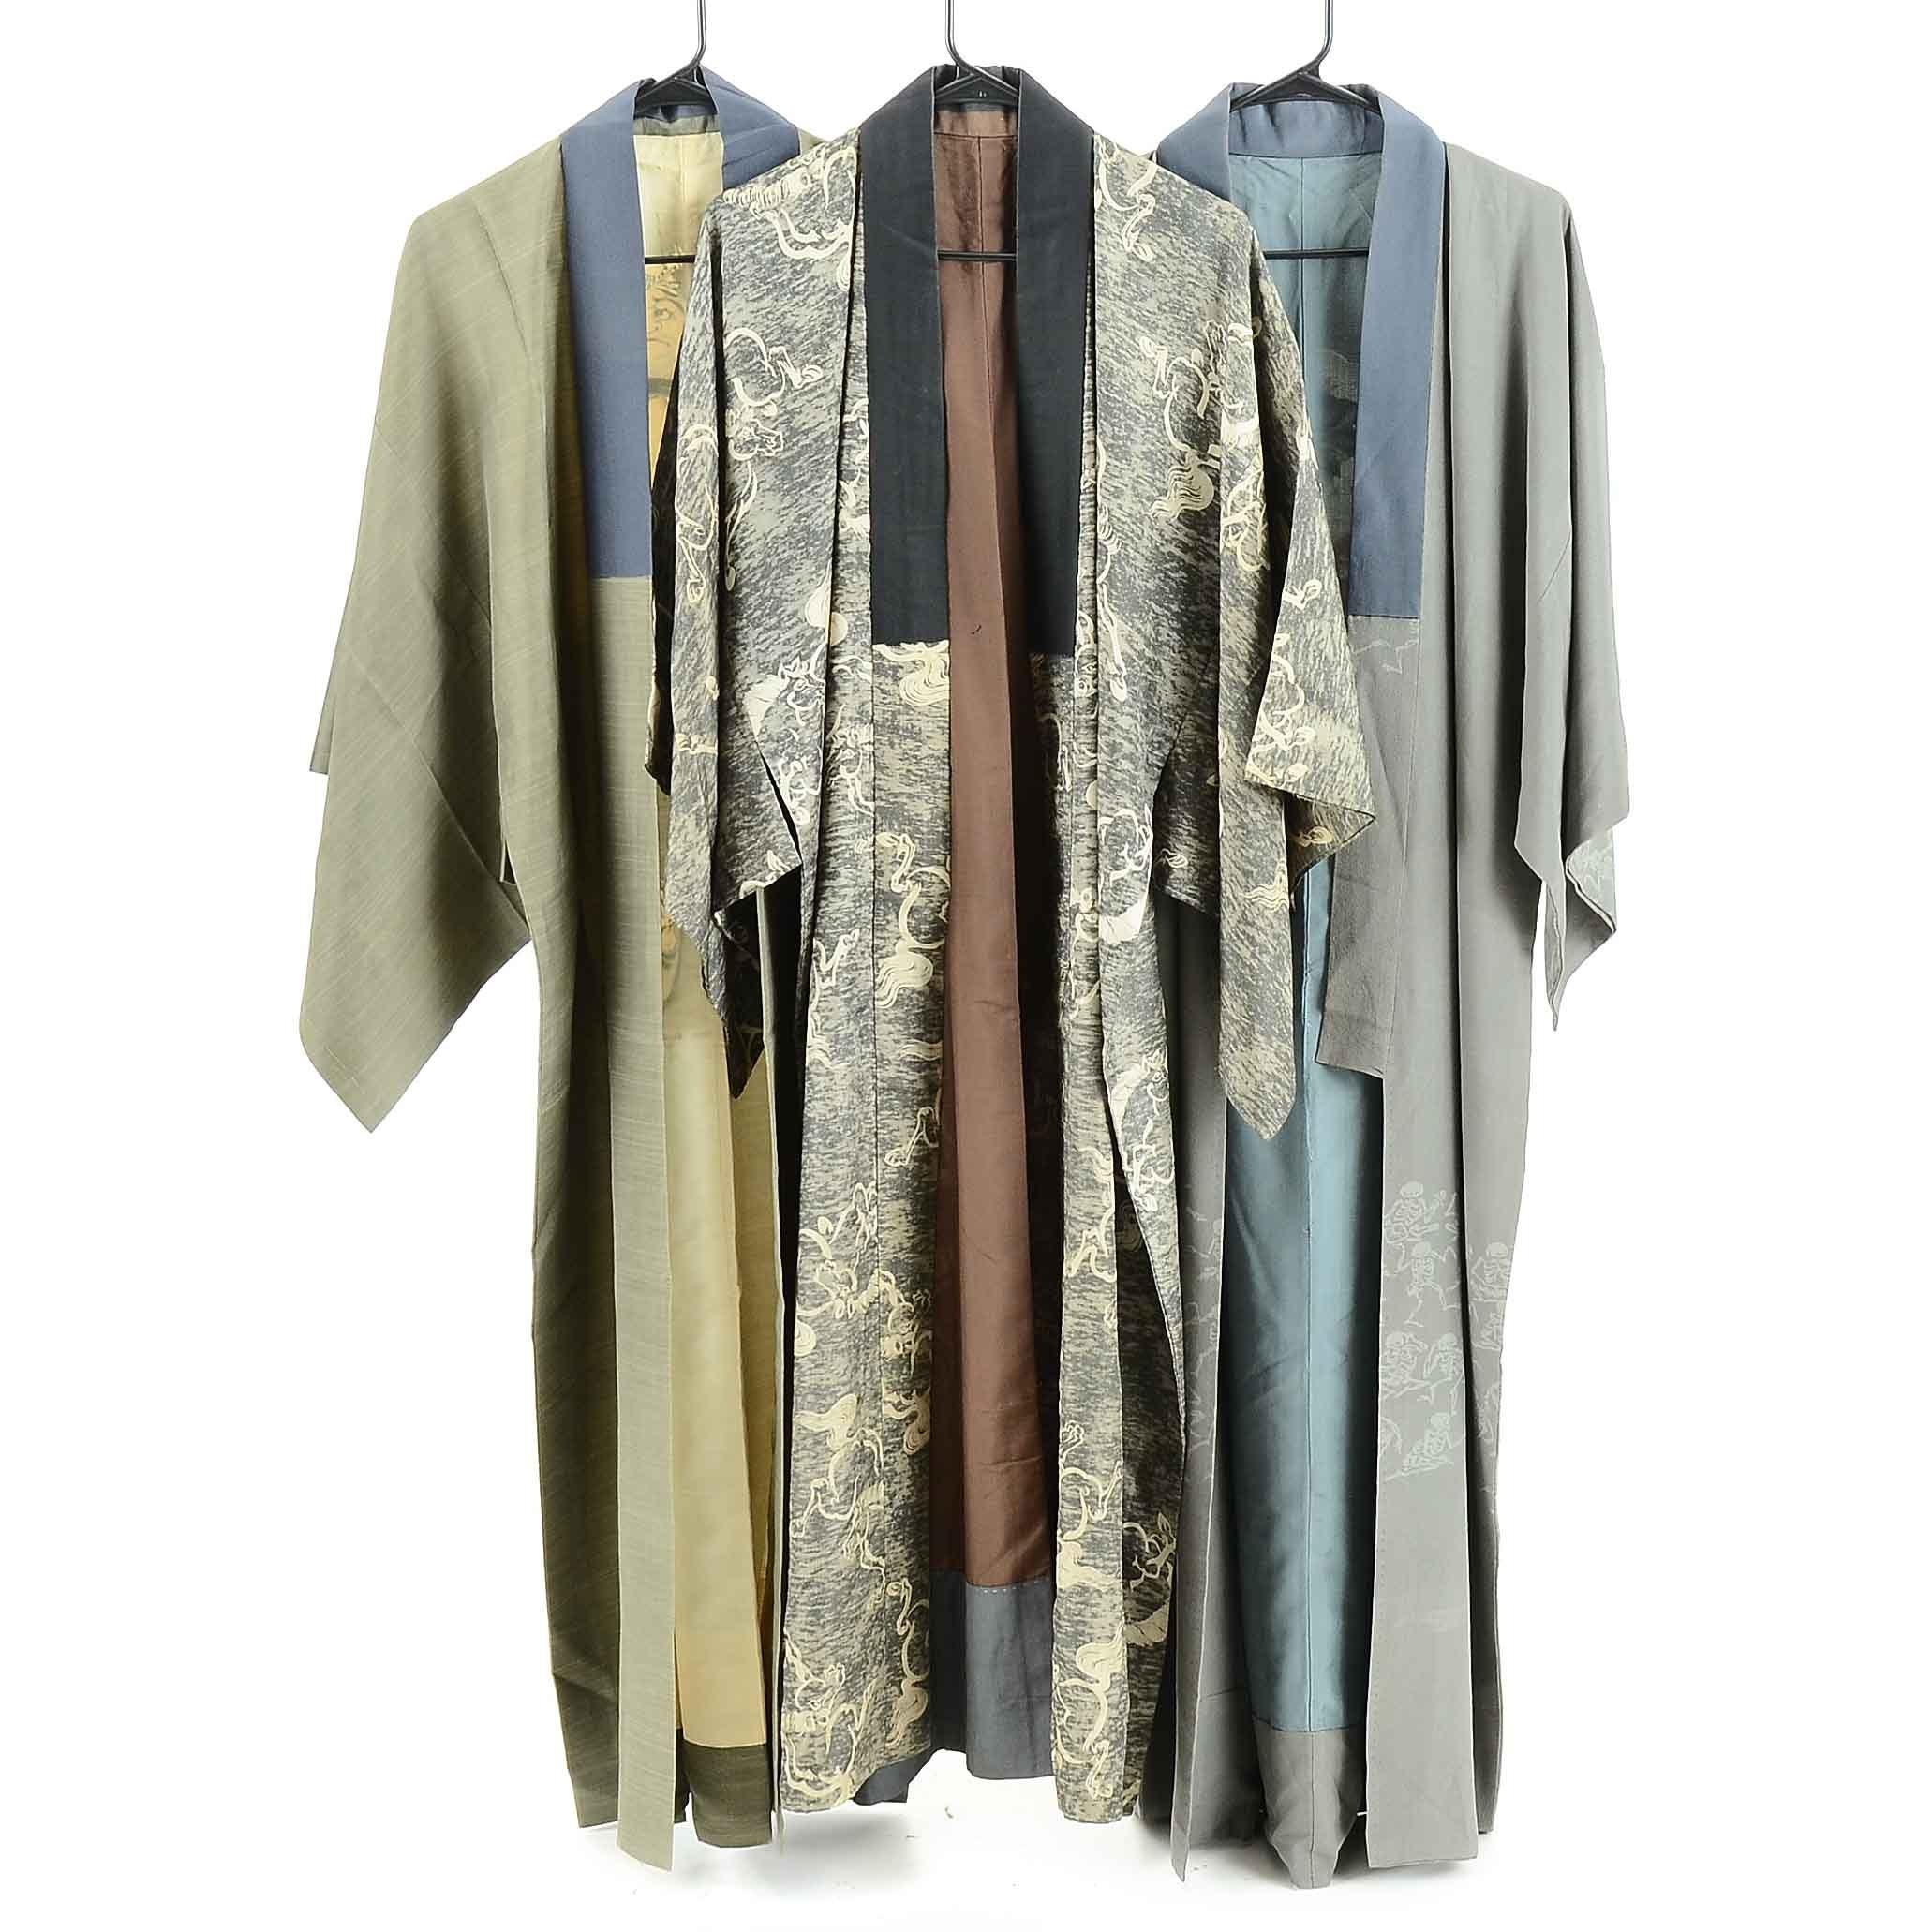 Vintage Japanese Dark Silk Kimonos